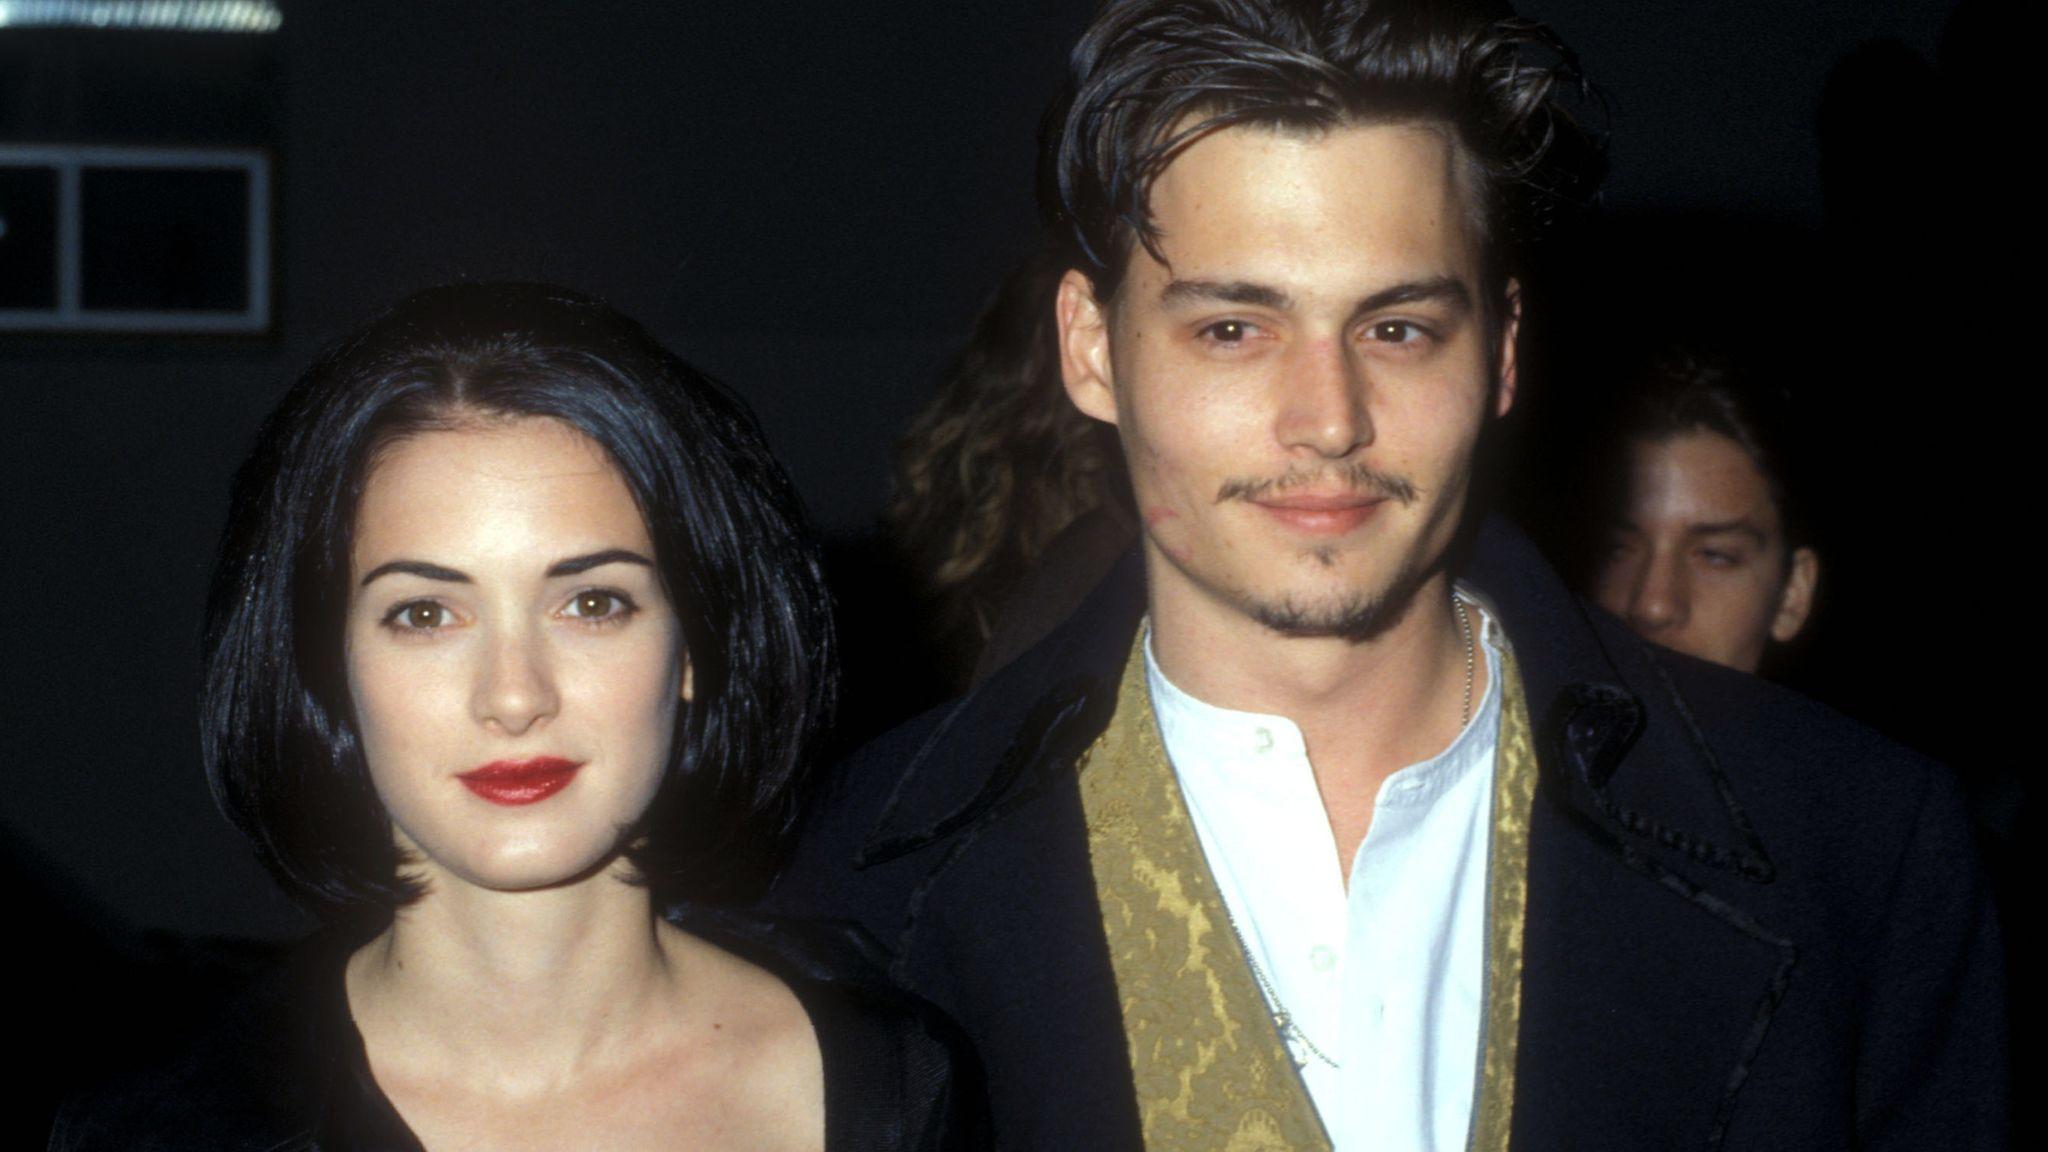 Winona Ryder & Johnny Depp at the Edward Scissorhands premiere in 1990